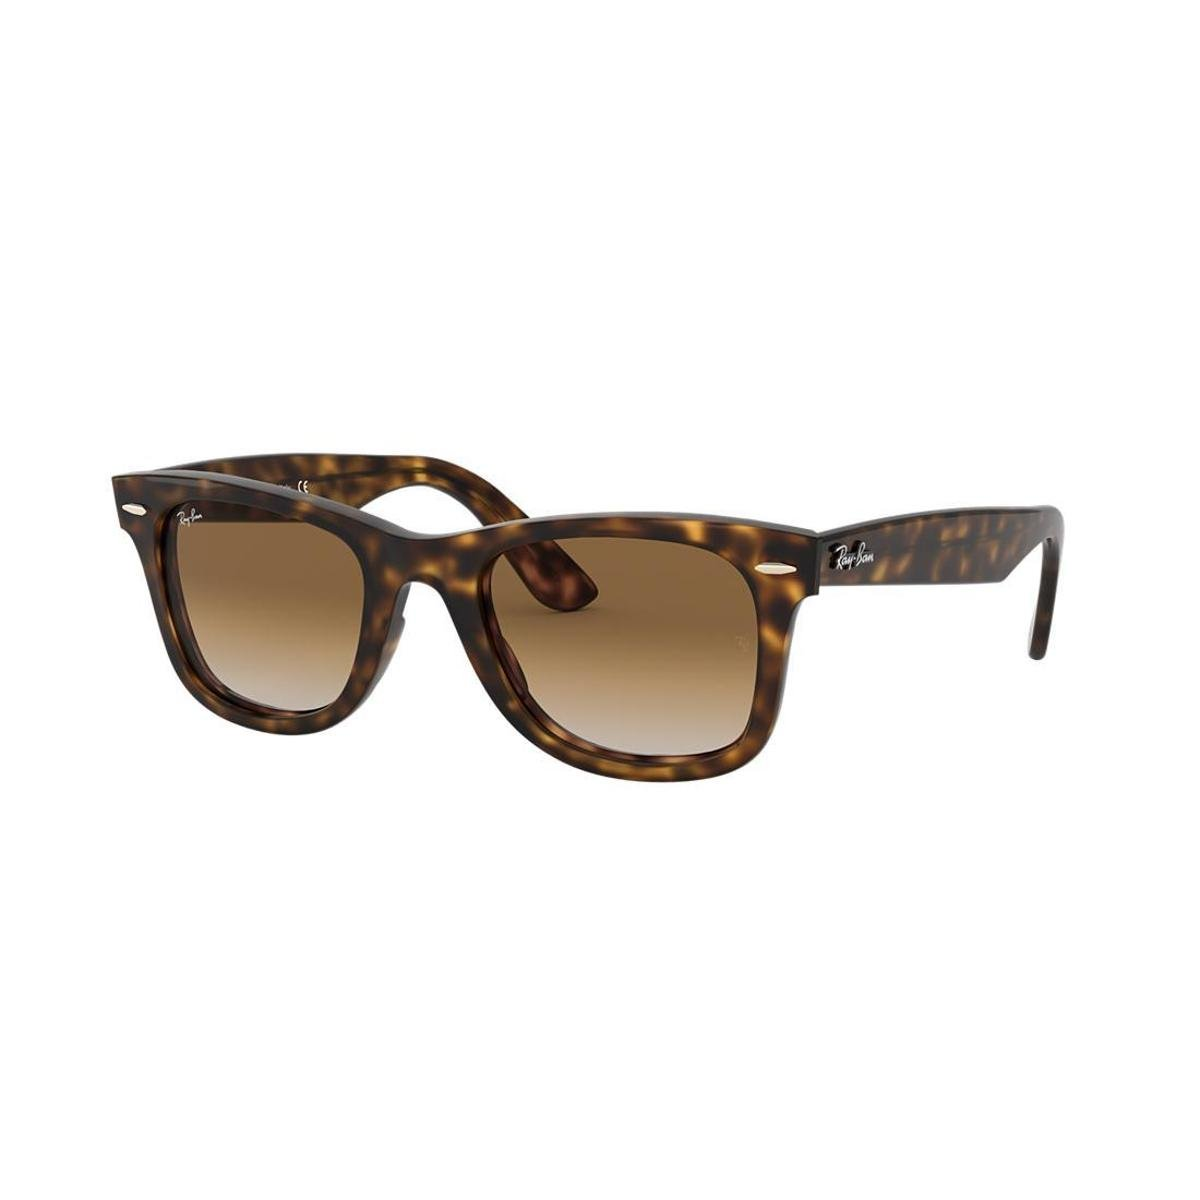 a9b442edc9295 Óculos de Sol Ray-Ban RB4340 Wayfarer - Marrom - Compre Agora